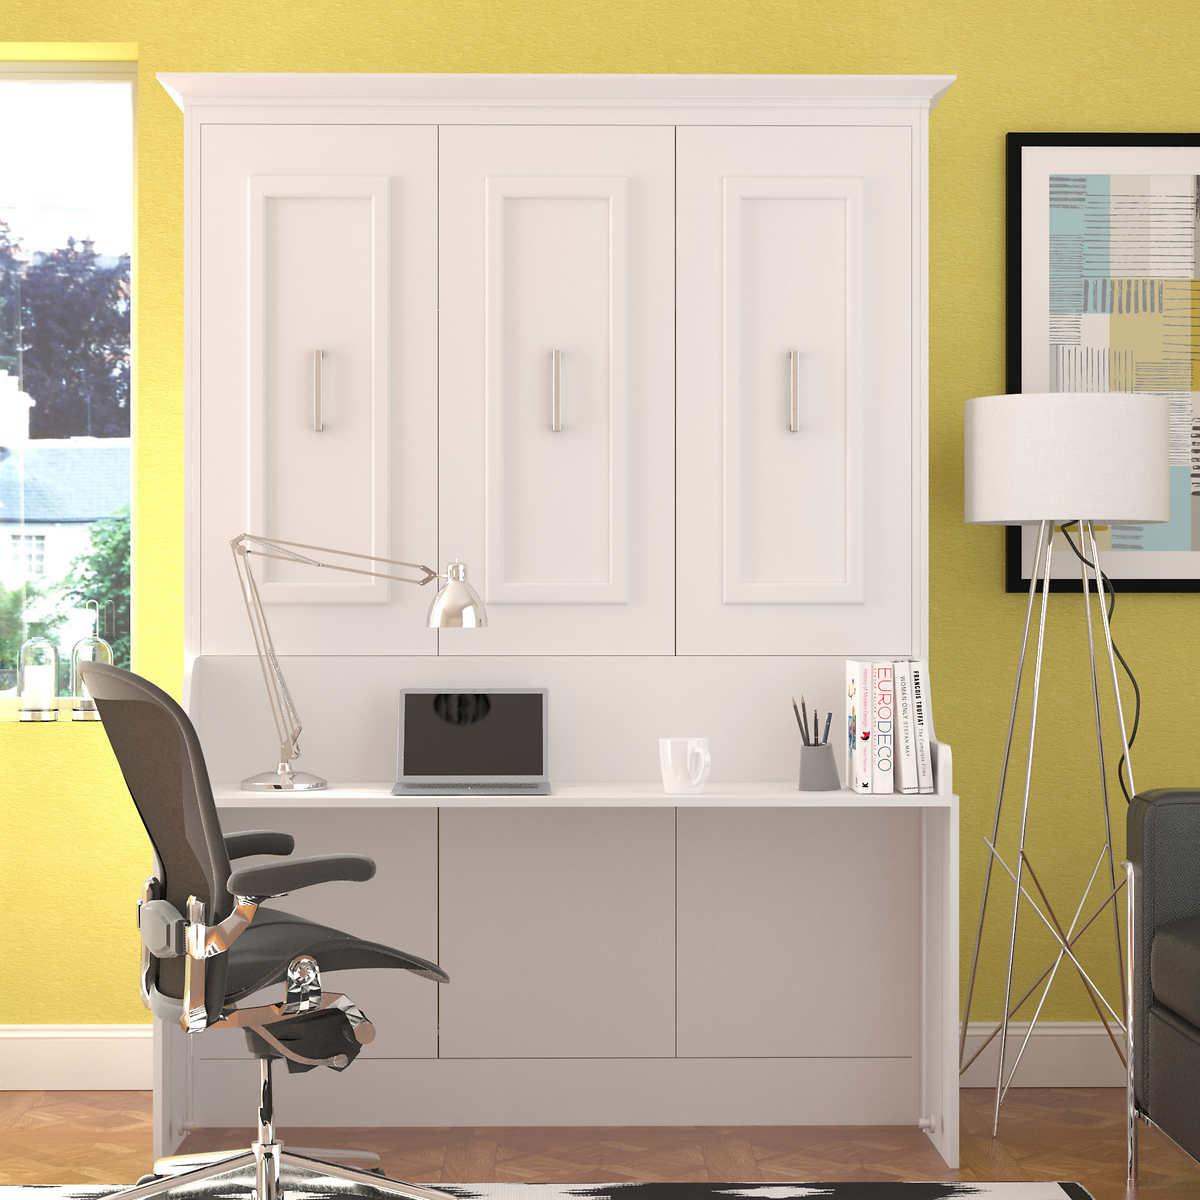 Zoom Room Murphy Bed Bed Room Porter Queen Portrait Wall Bed With Internal Storage In